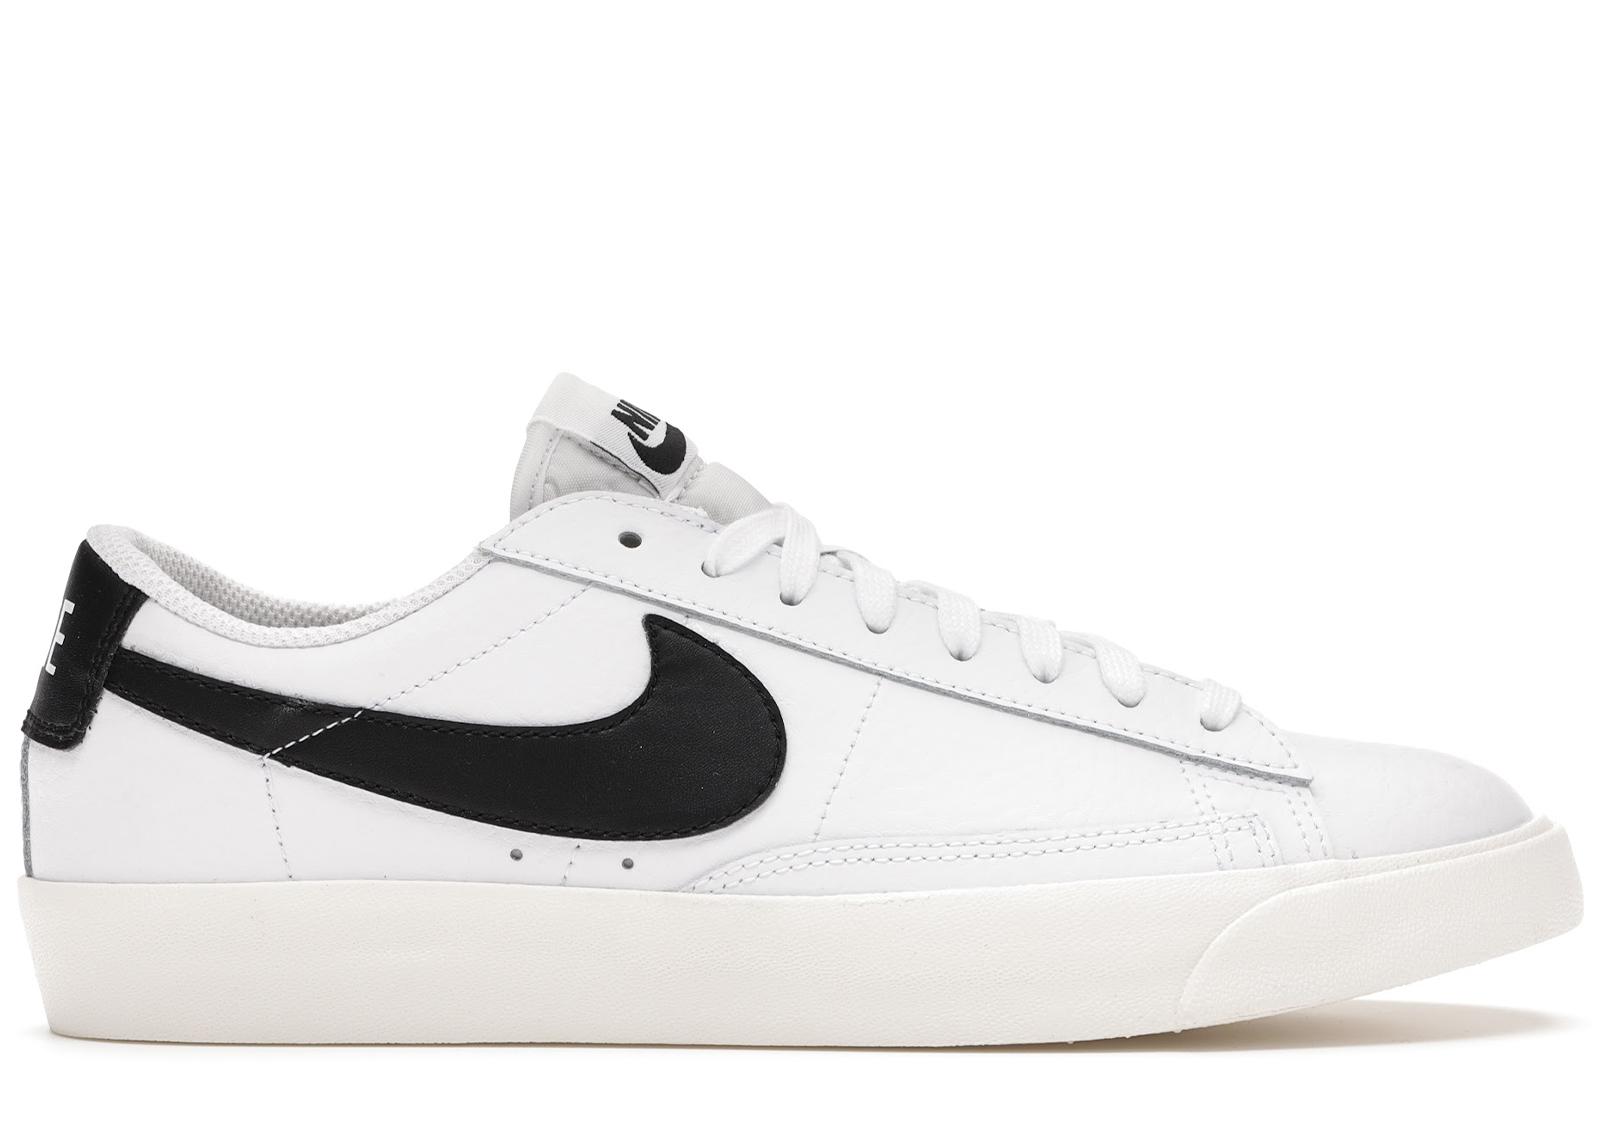 Nike Blazer Low Leather White Black - CI6377-101